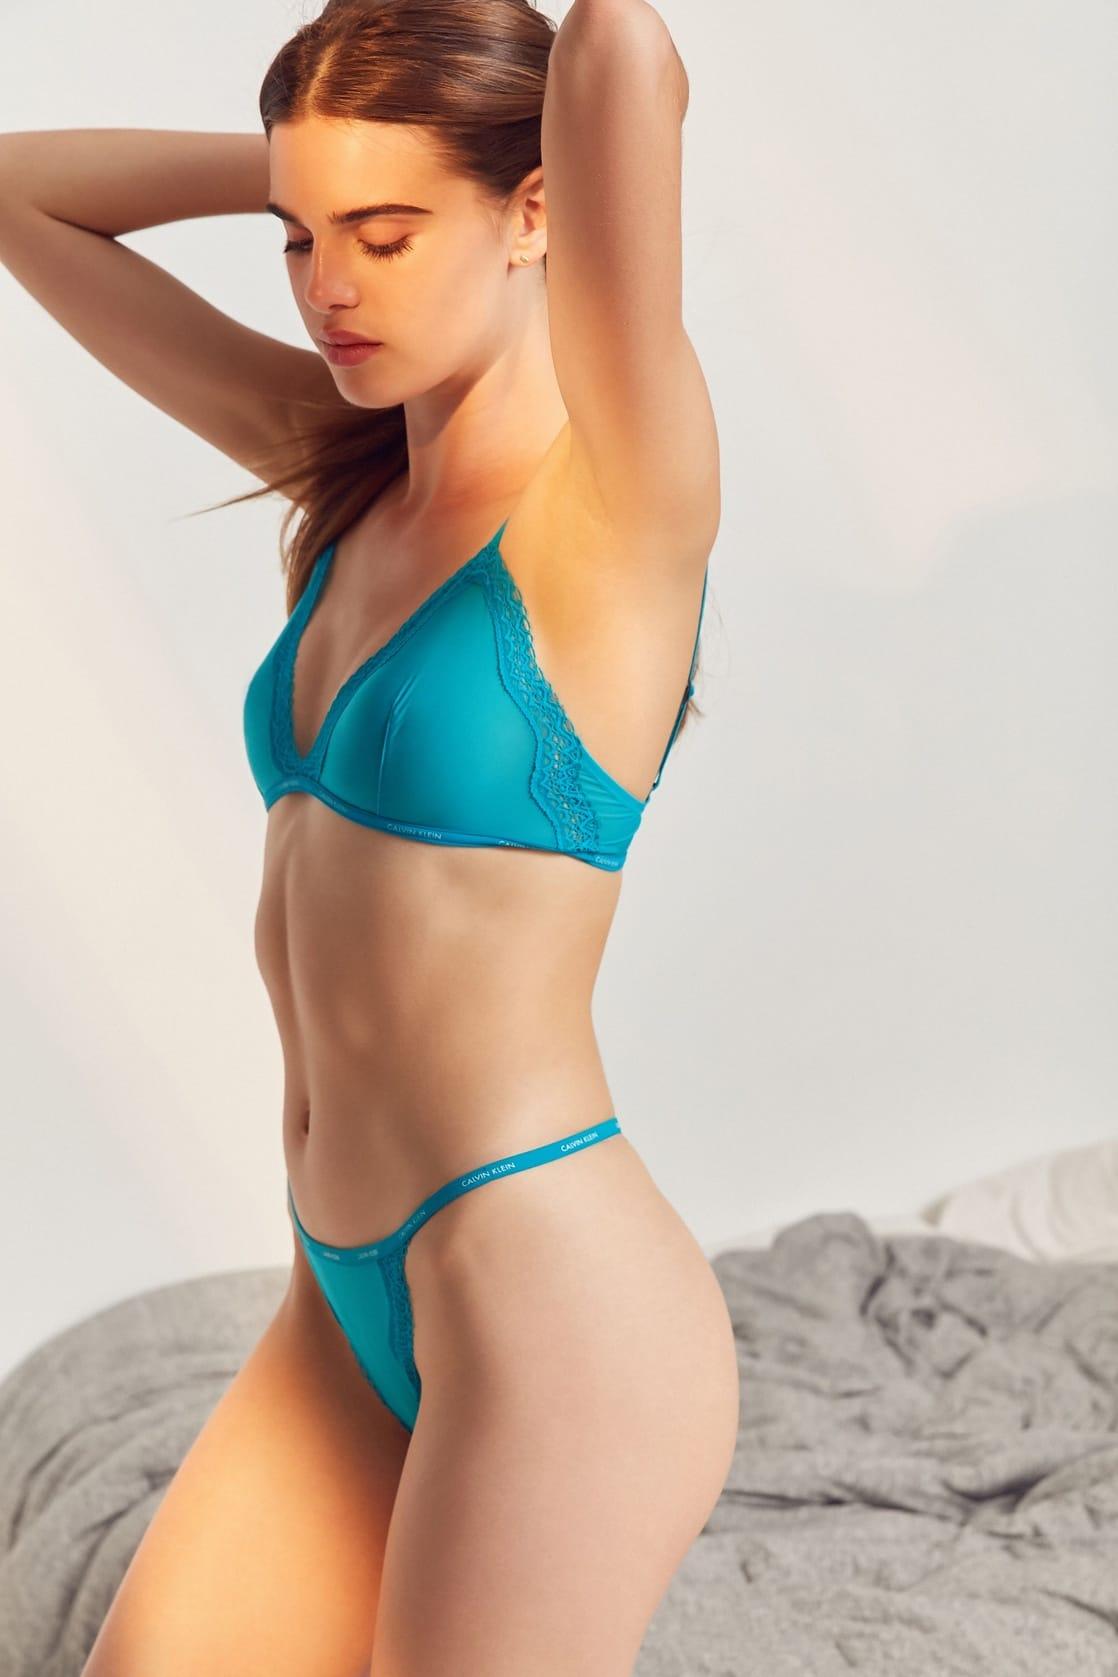 Bikini Zoi Mantzakanis nudes (63 photo), Tits, Bikini, Selfie, bra 2020